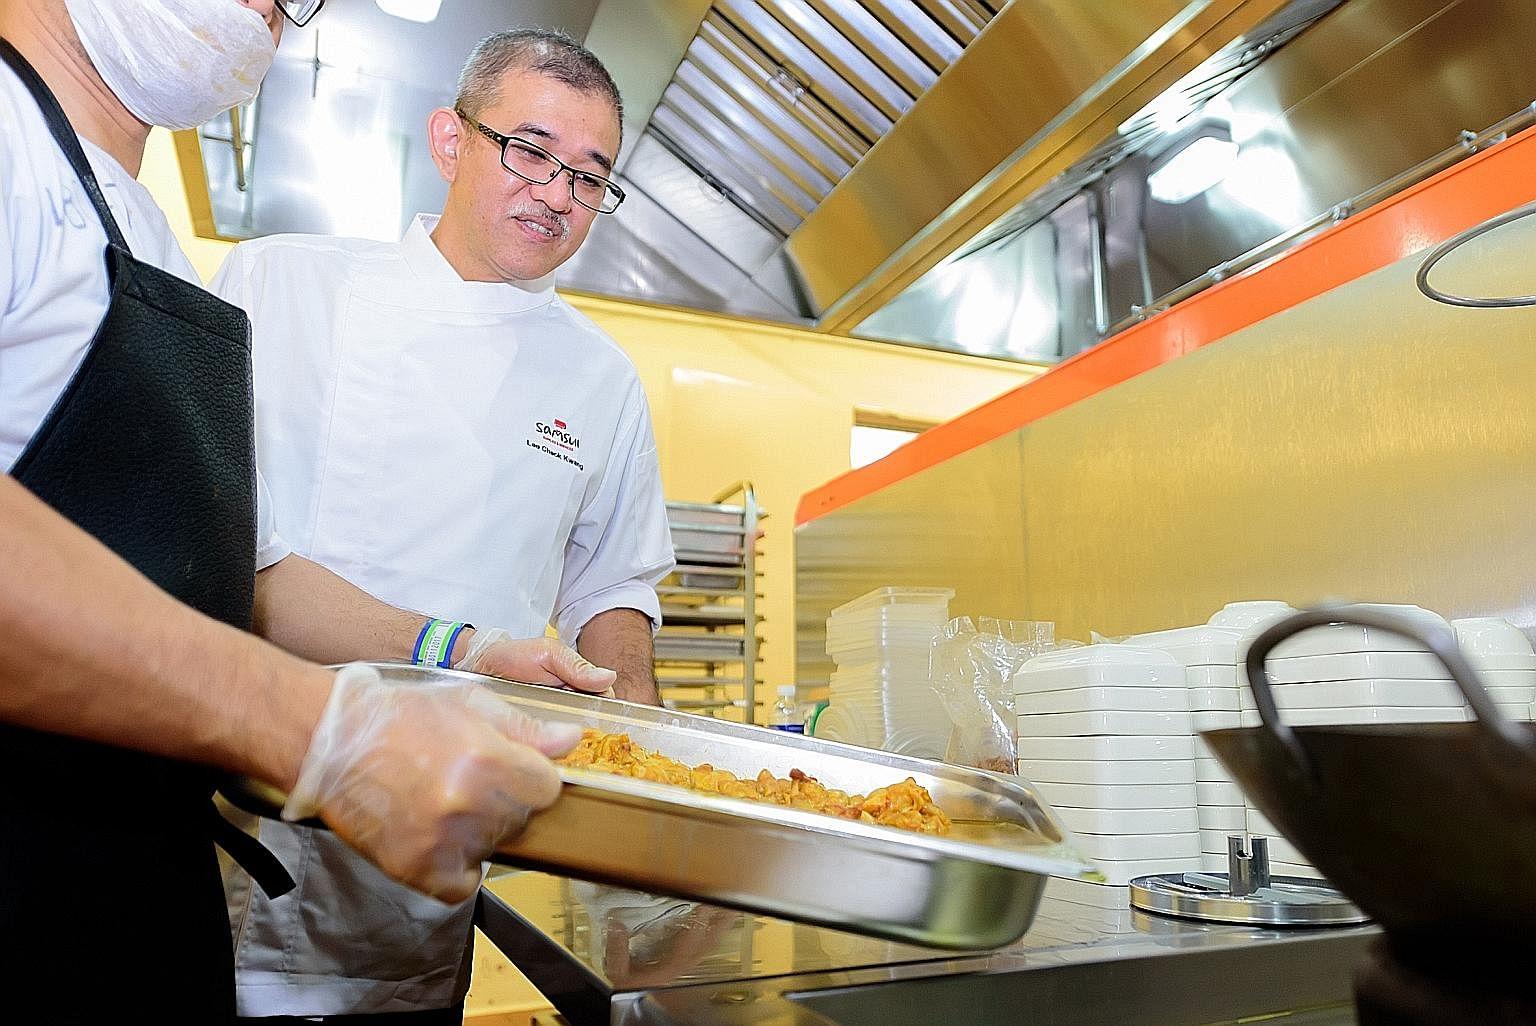 Prison Kitchen Supplies Nursing Home Meals Singapore News Top Stories The Straits Times